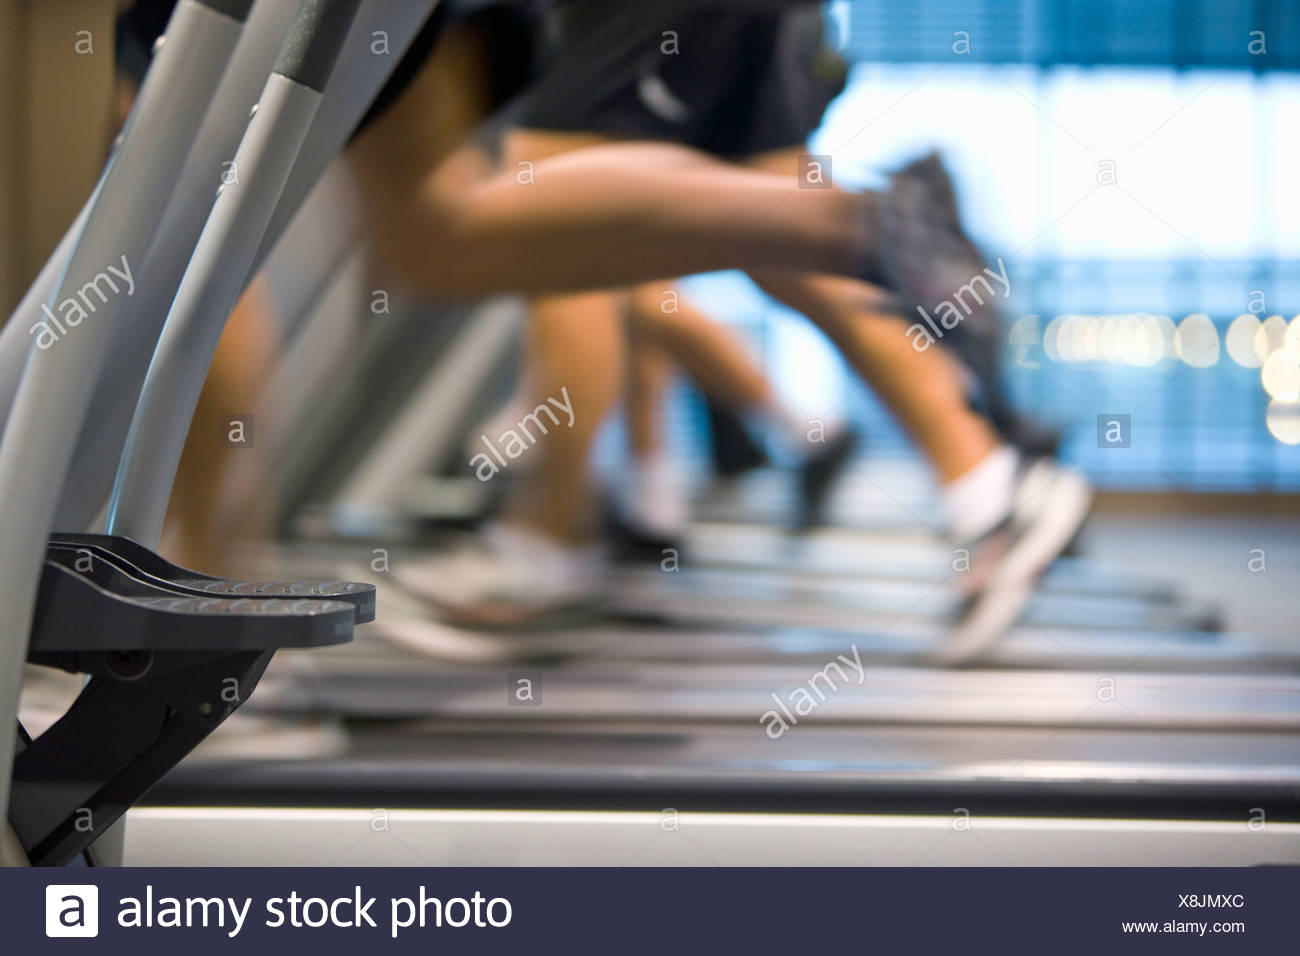 Legs running on treadmills in health club - Stock Image